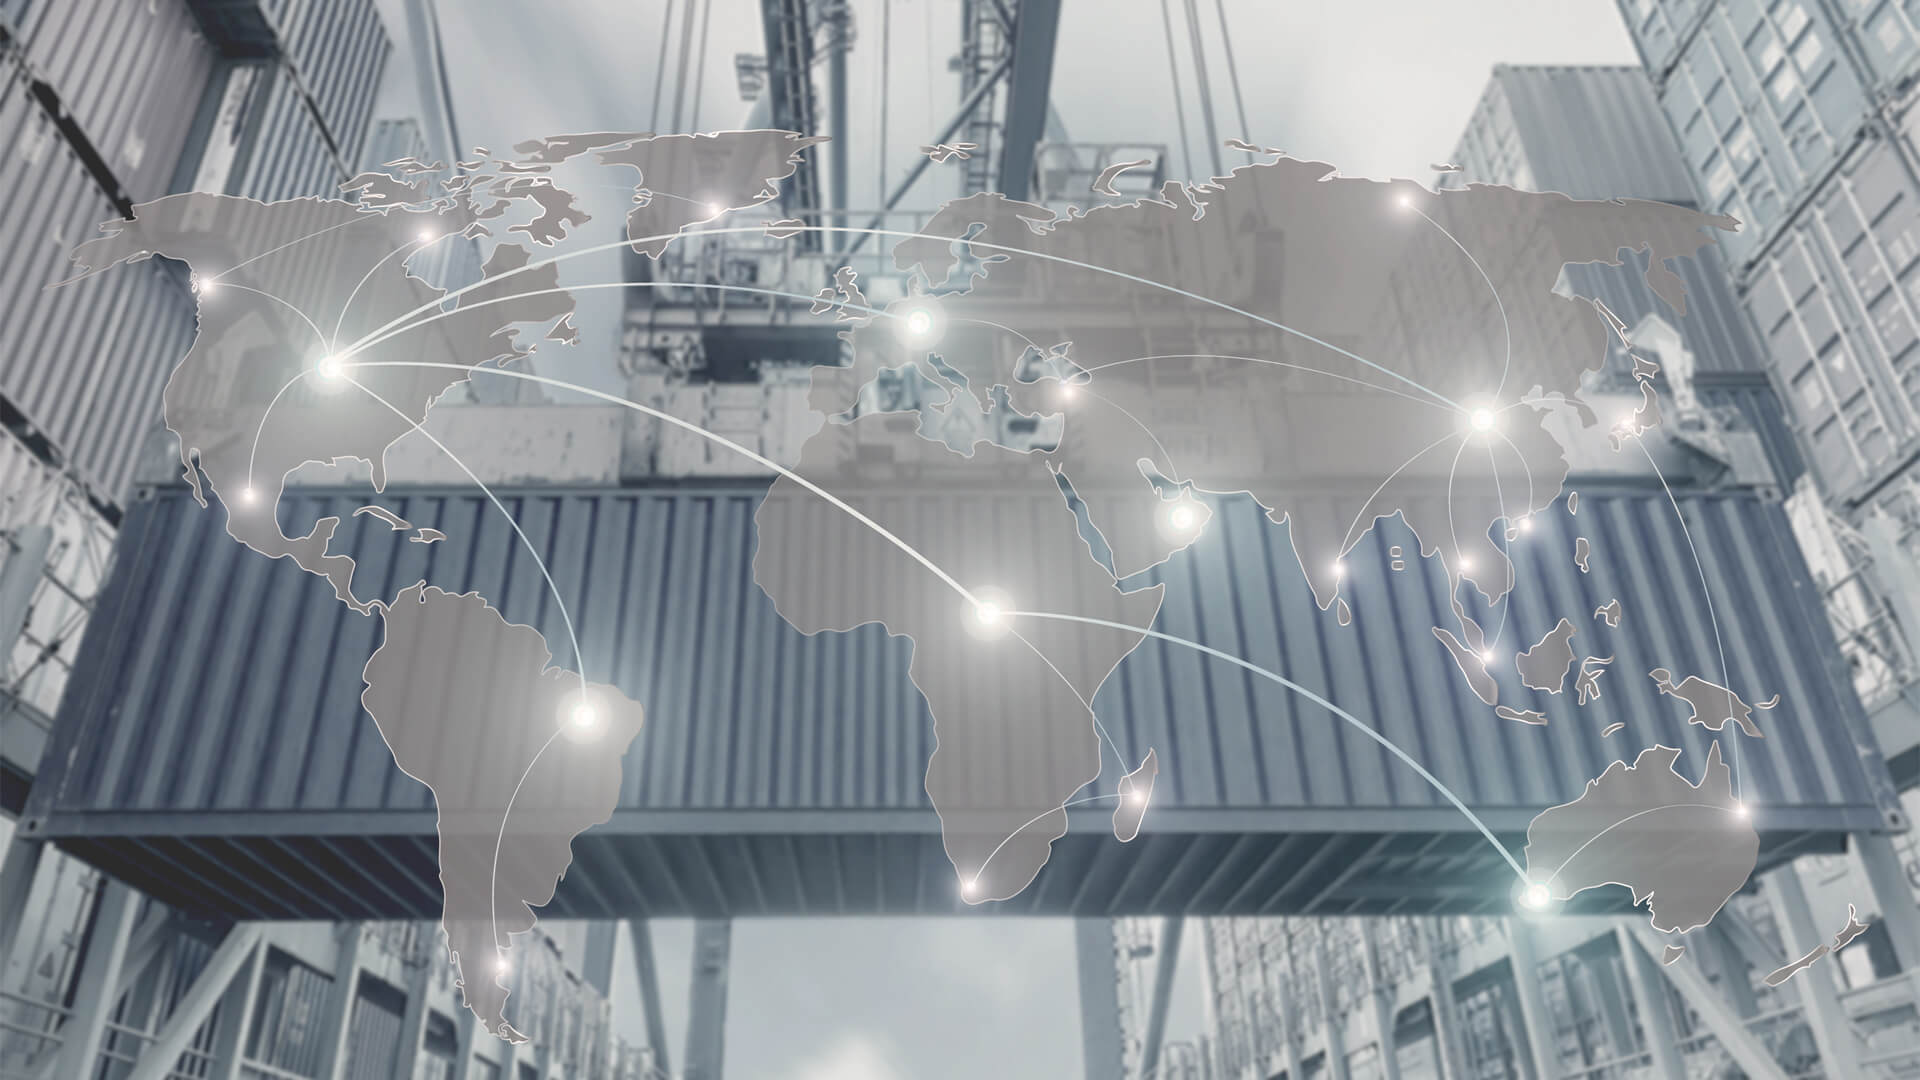 c-land-logistics-solution-helhetslosning-logistik